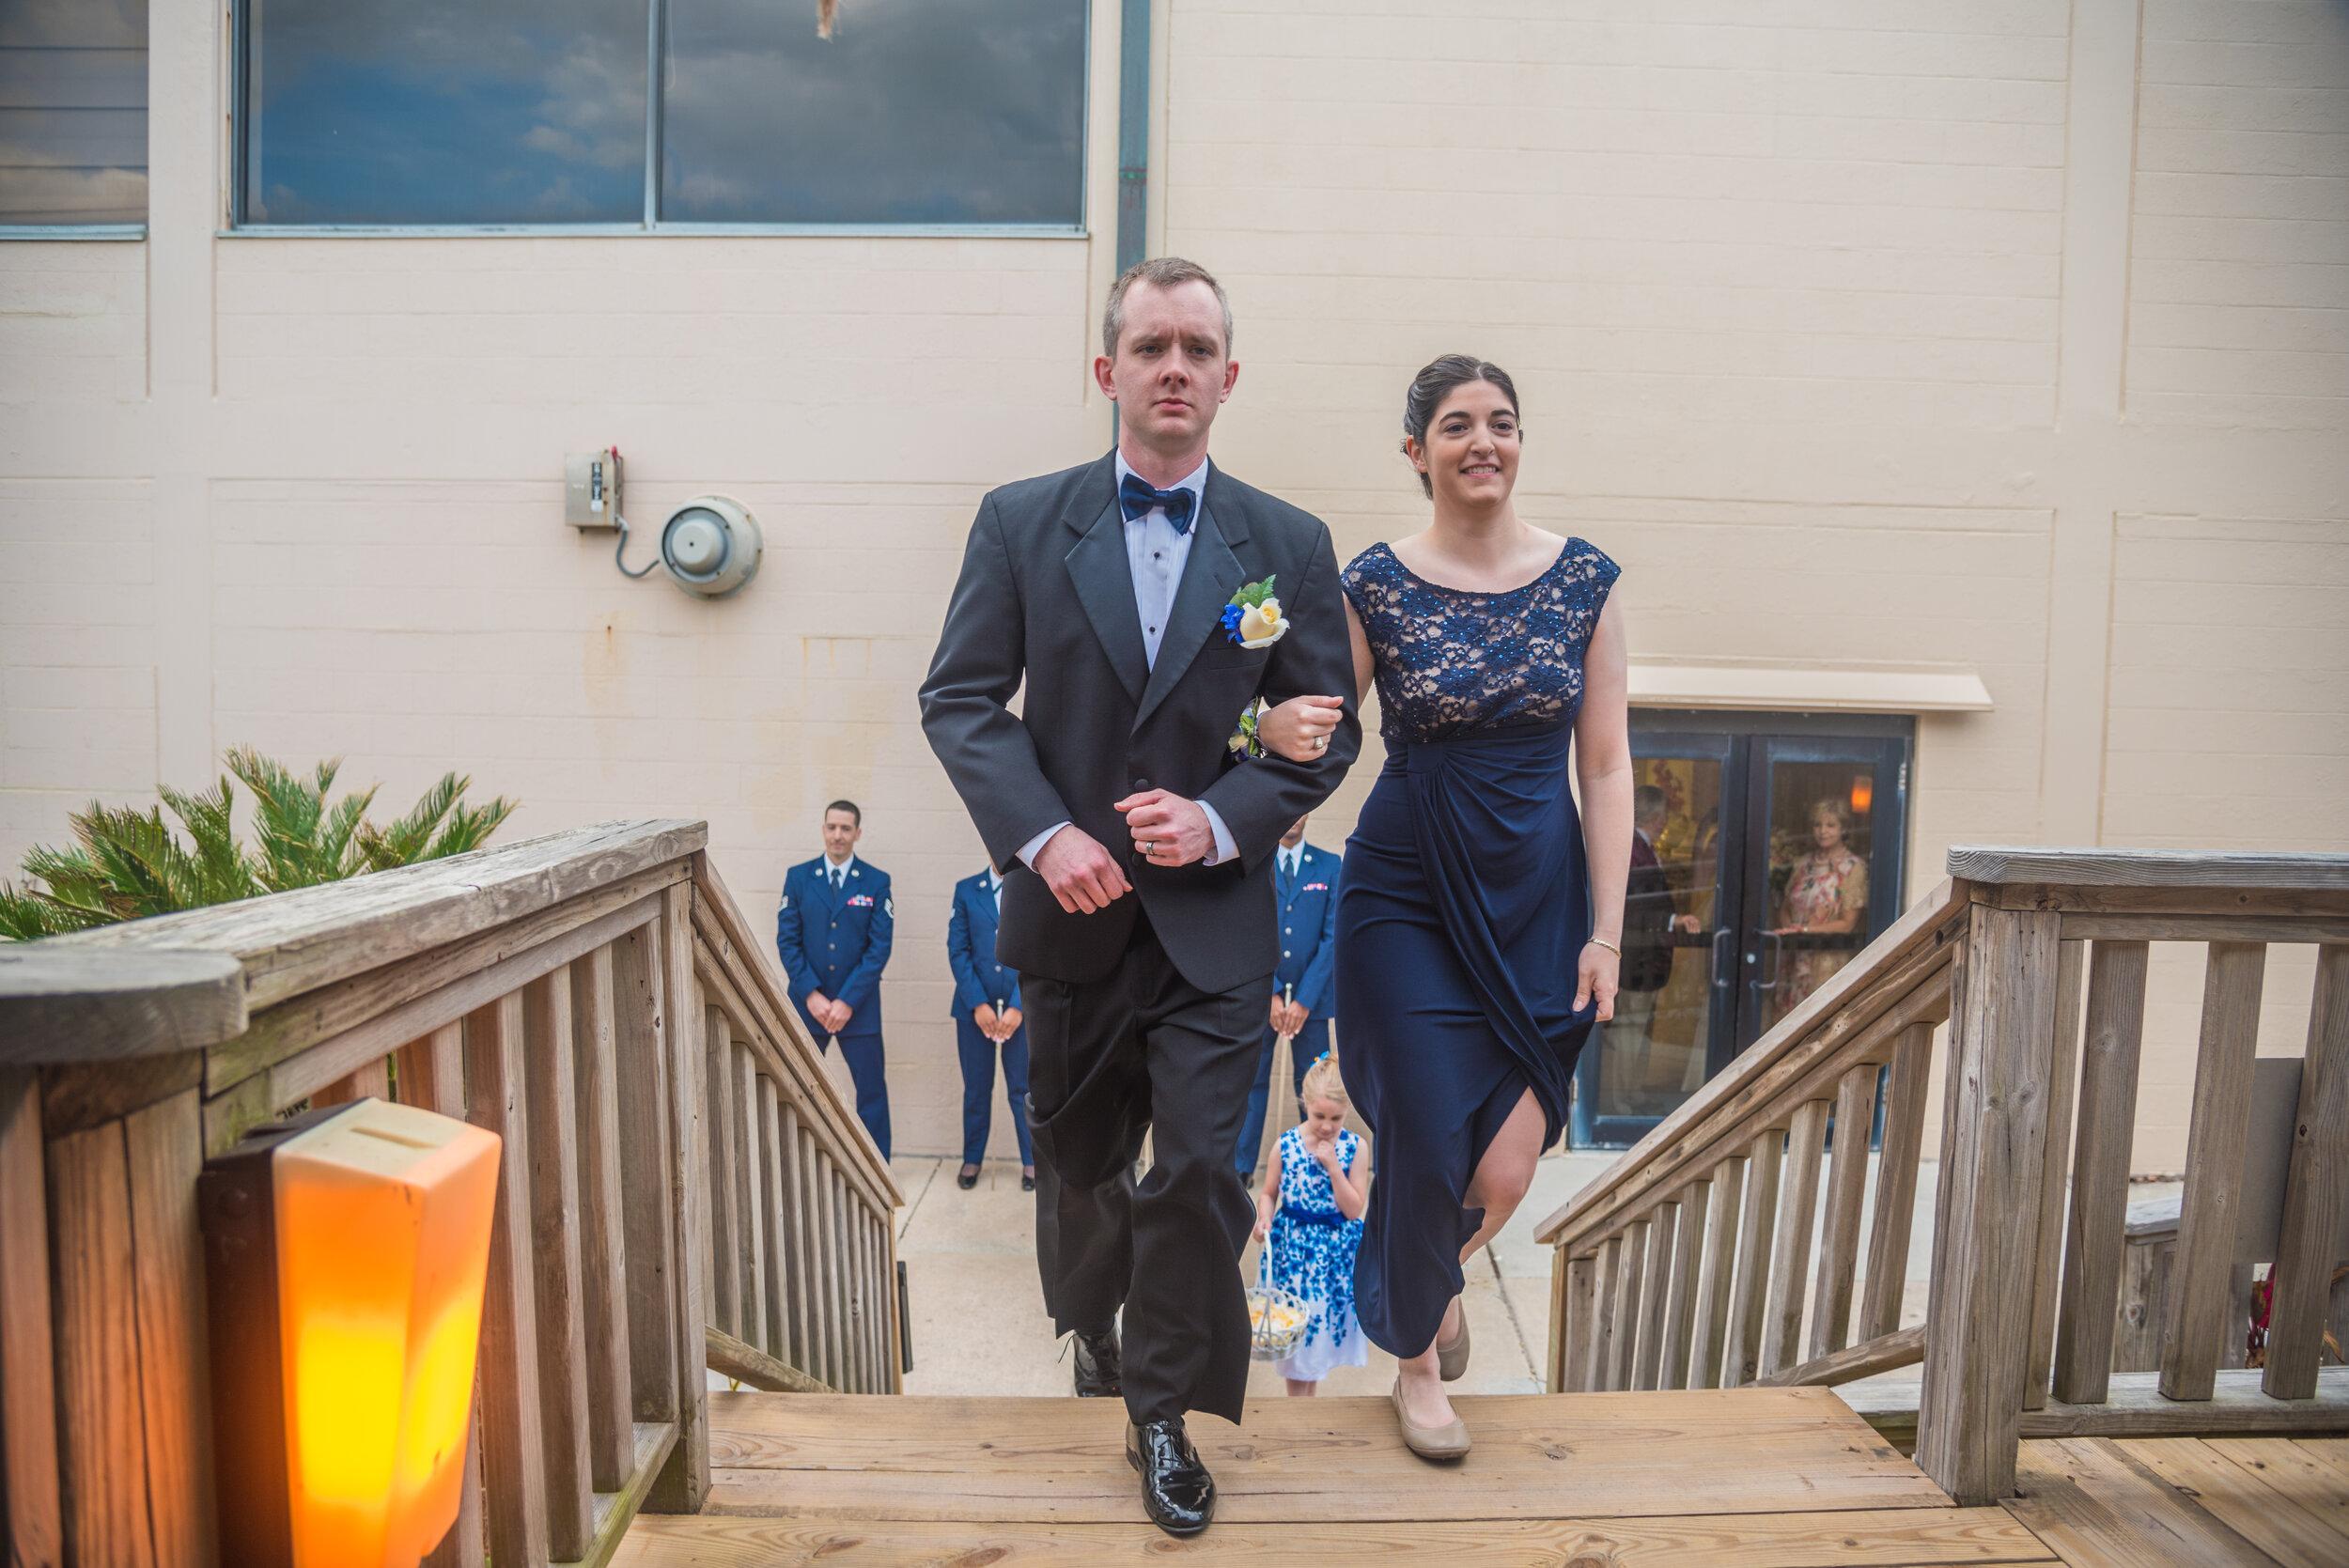 andru-the-tide-club-air-force-wedding-patrickafb-1-23.jpg